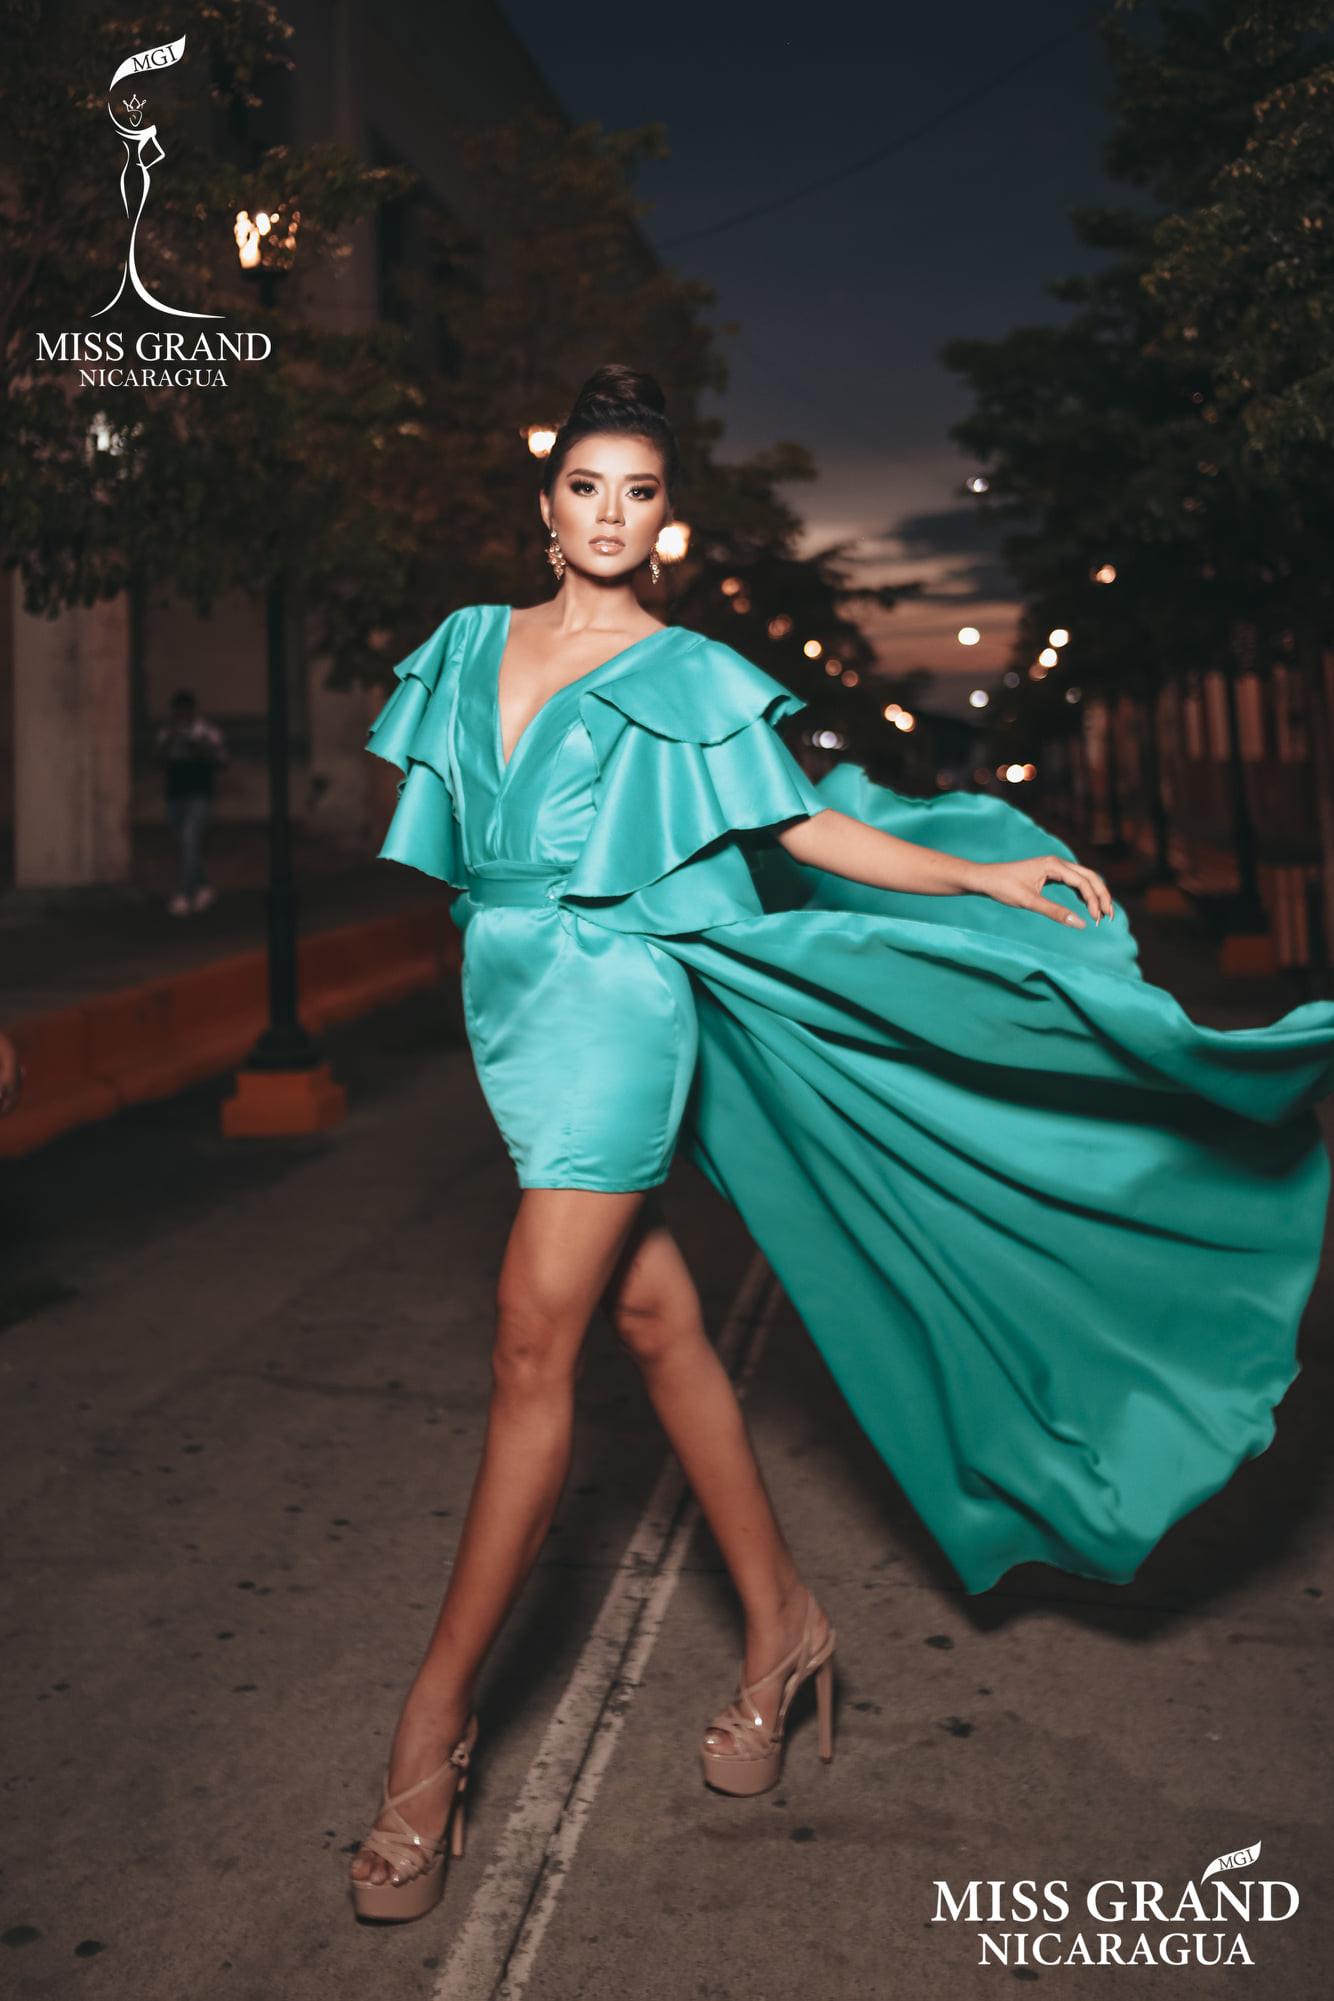 candidatas a miss grand nicaragua 2021. final: 31 july. - Página 2 O5Tkzu